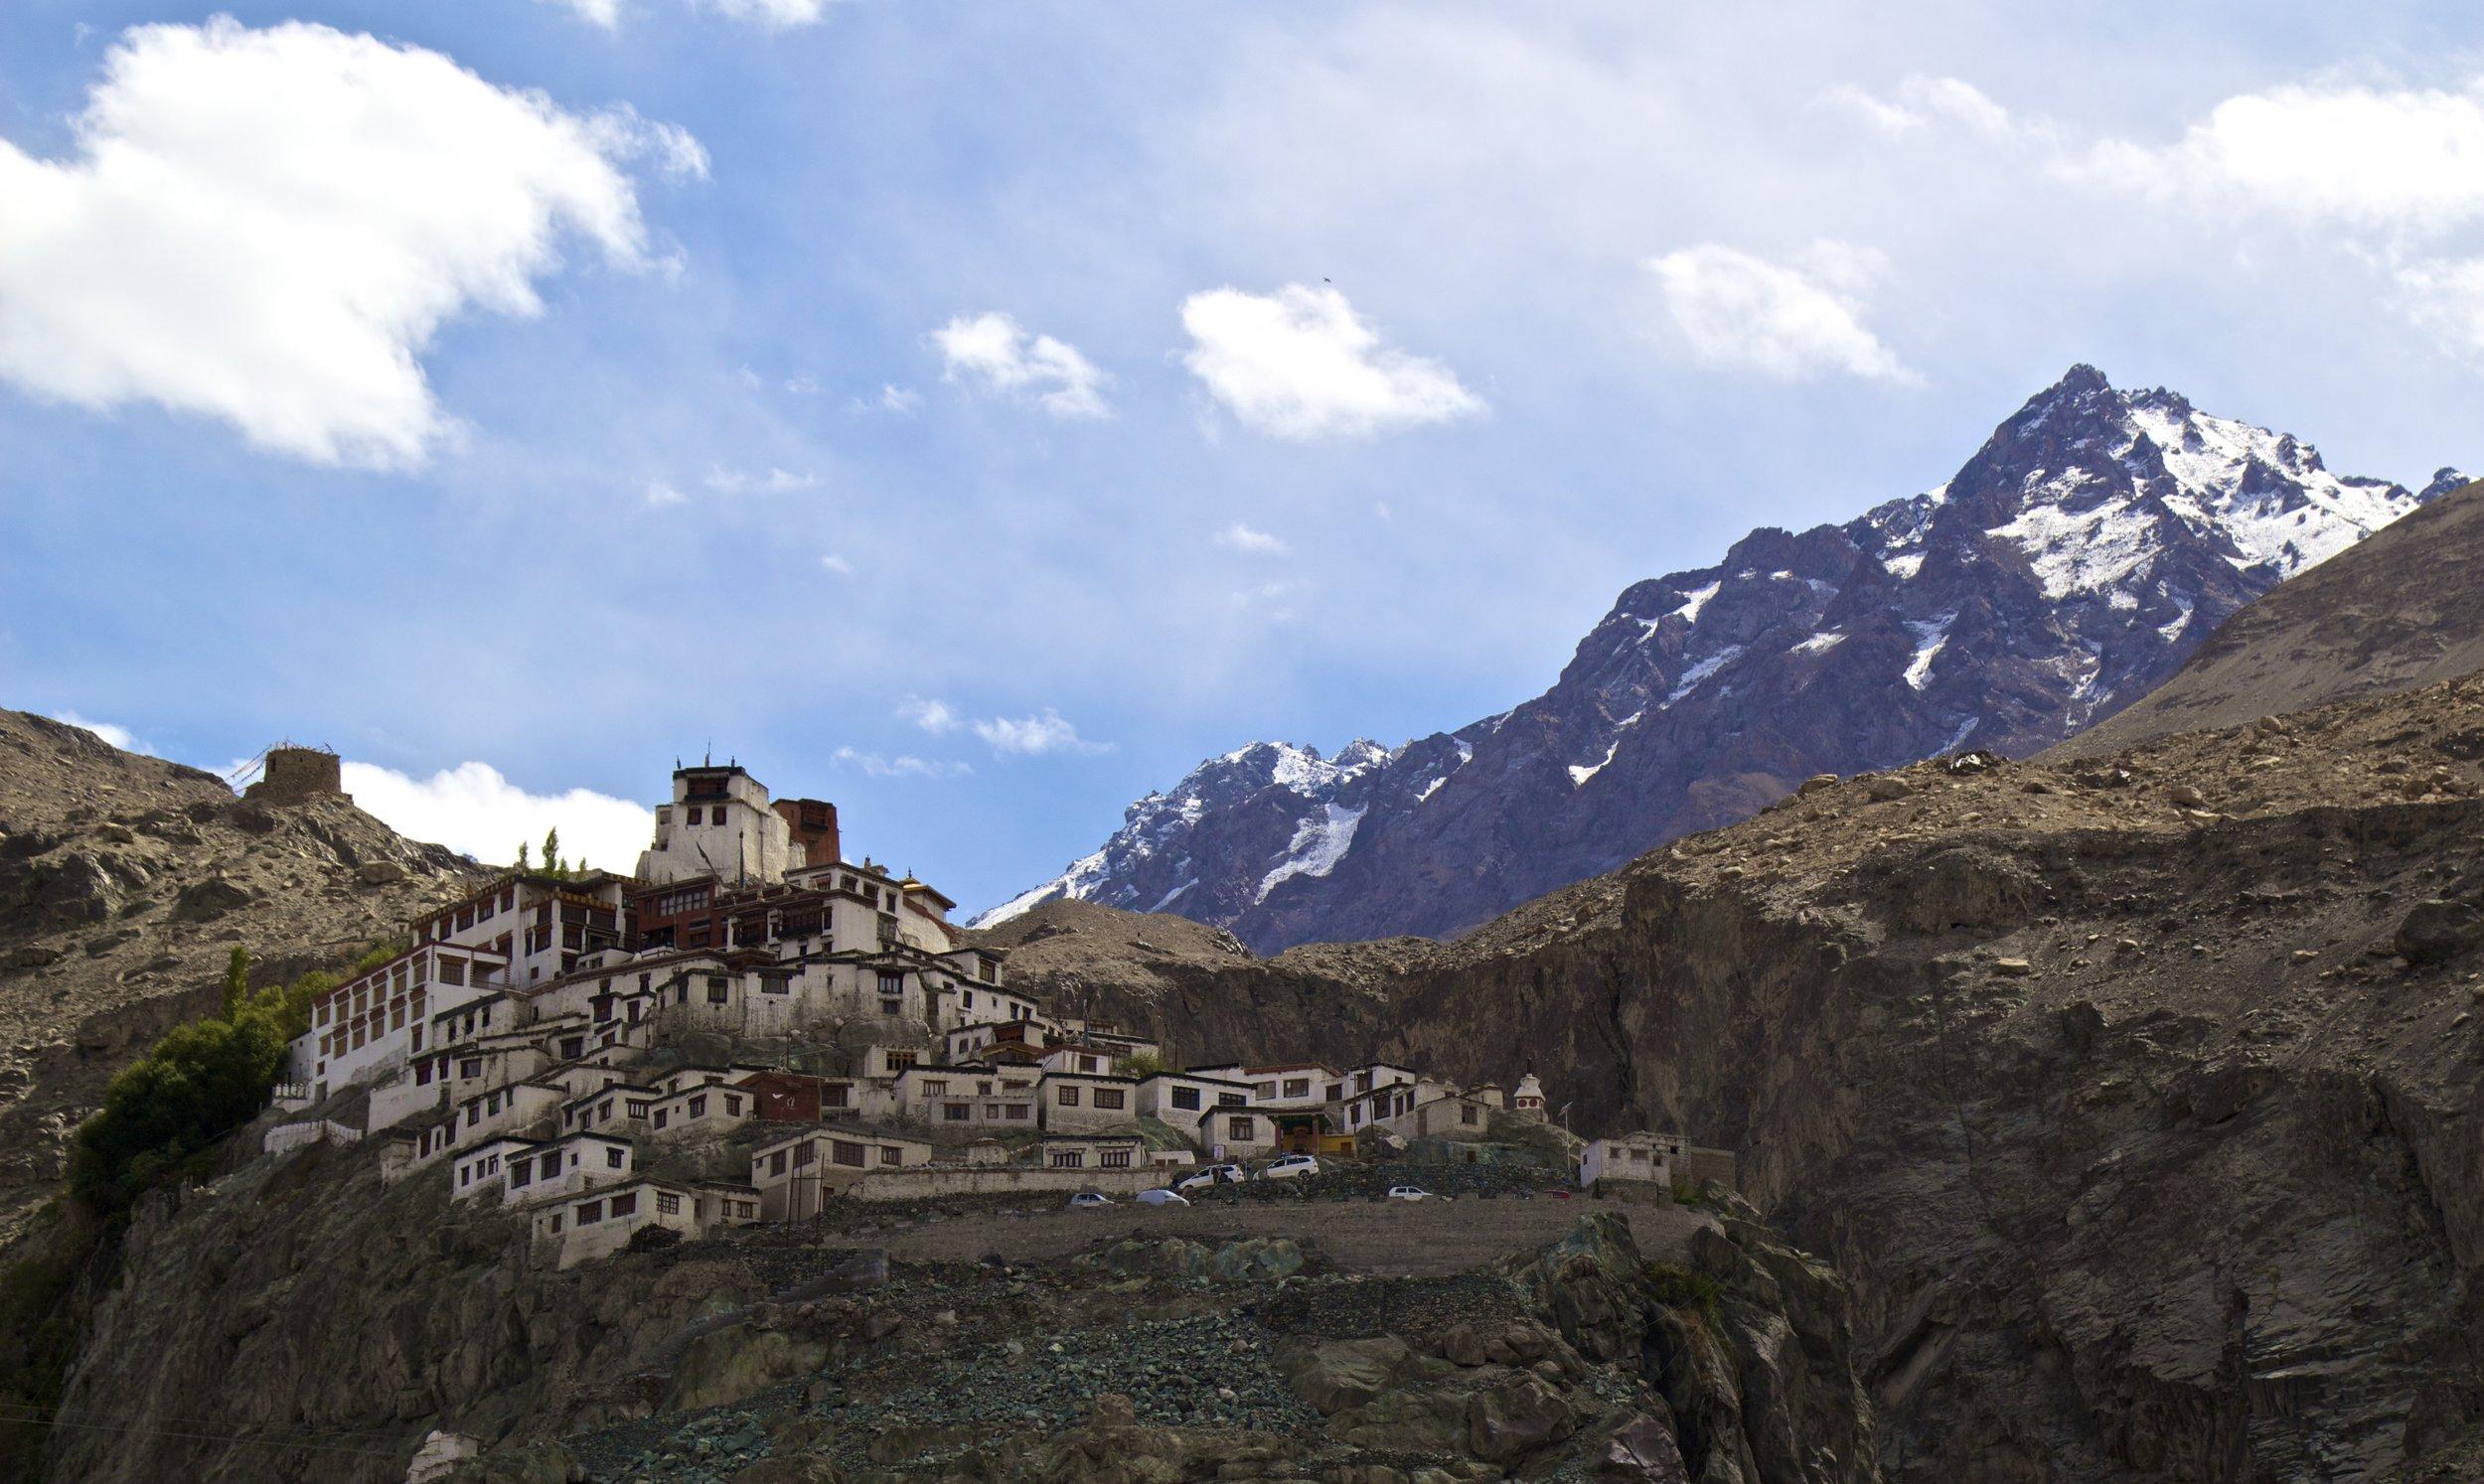 Nubra Valley Ladakh Kashmir Indian Himalayas Monastery 2.jpg